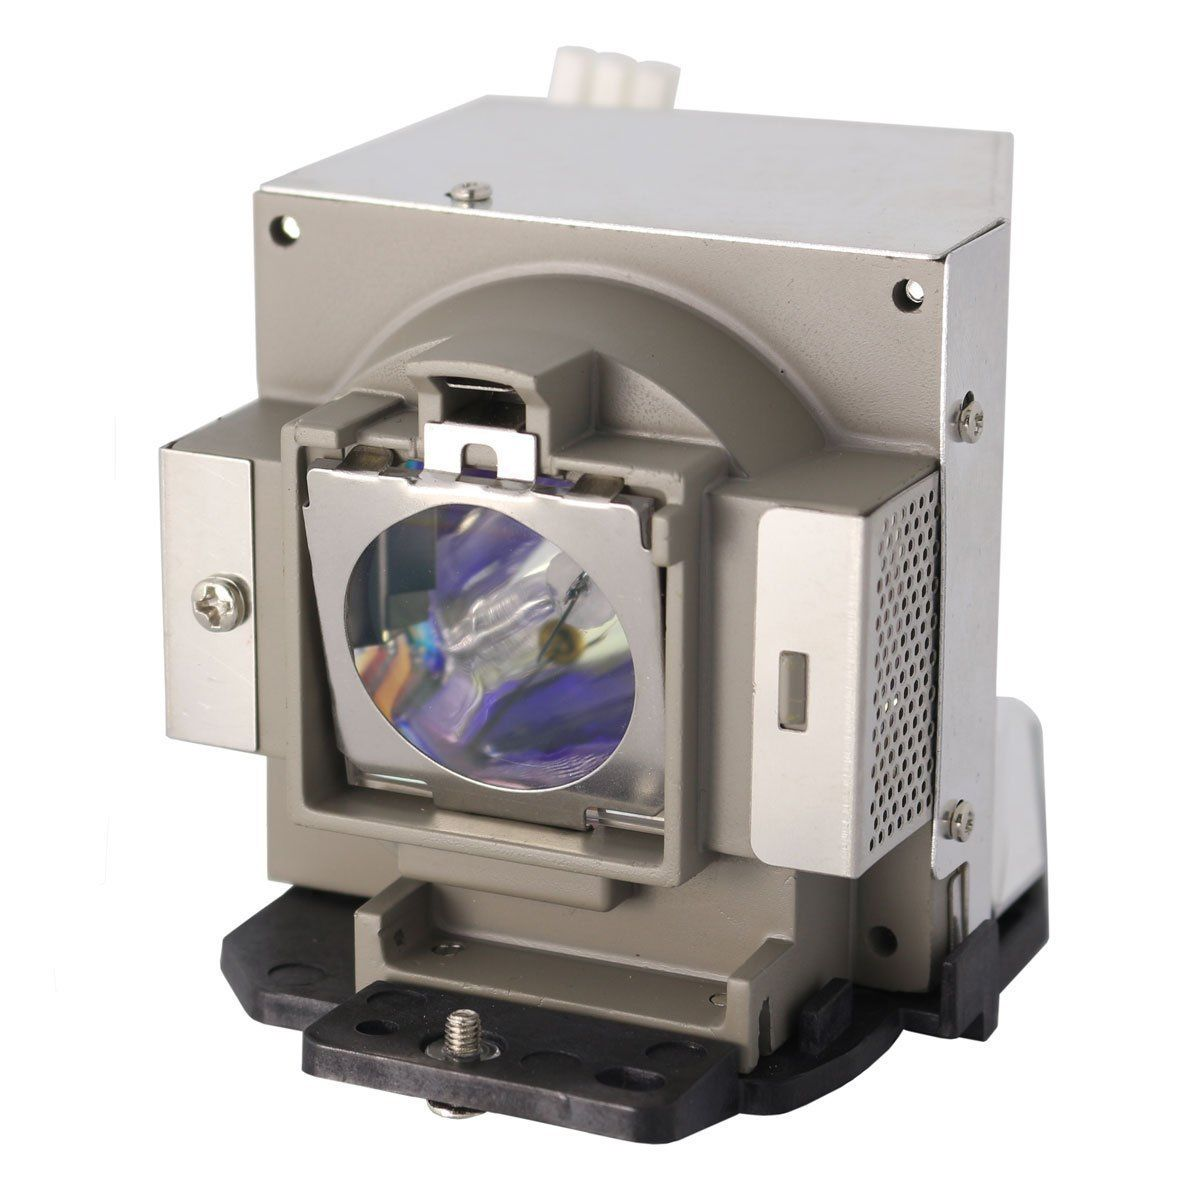 Projector Lamp Bulb 5J.J3K05.001 for BenQ MW811ST MW714ST with housingProjector Lamp Bulb 5J.J3K05.001 for BenQ MW811ST MW714ST with housing